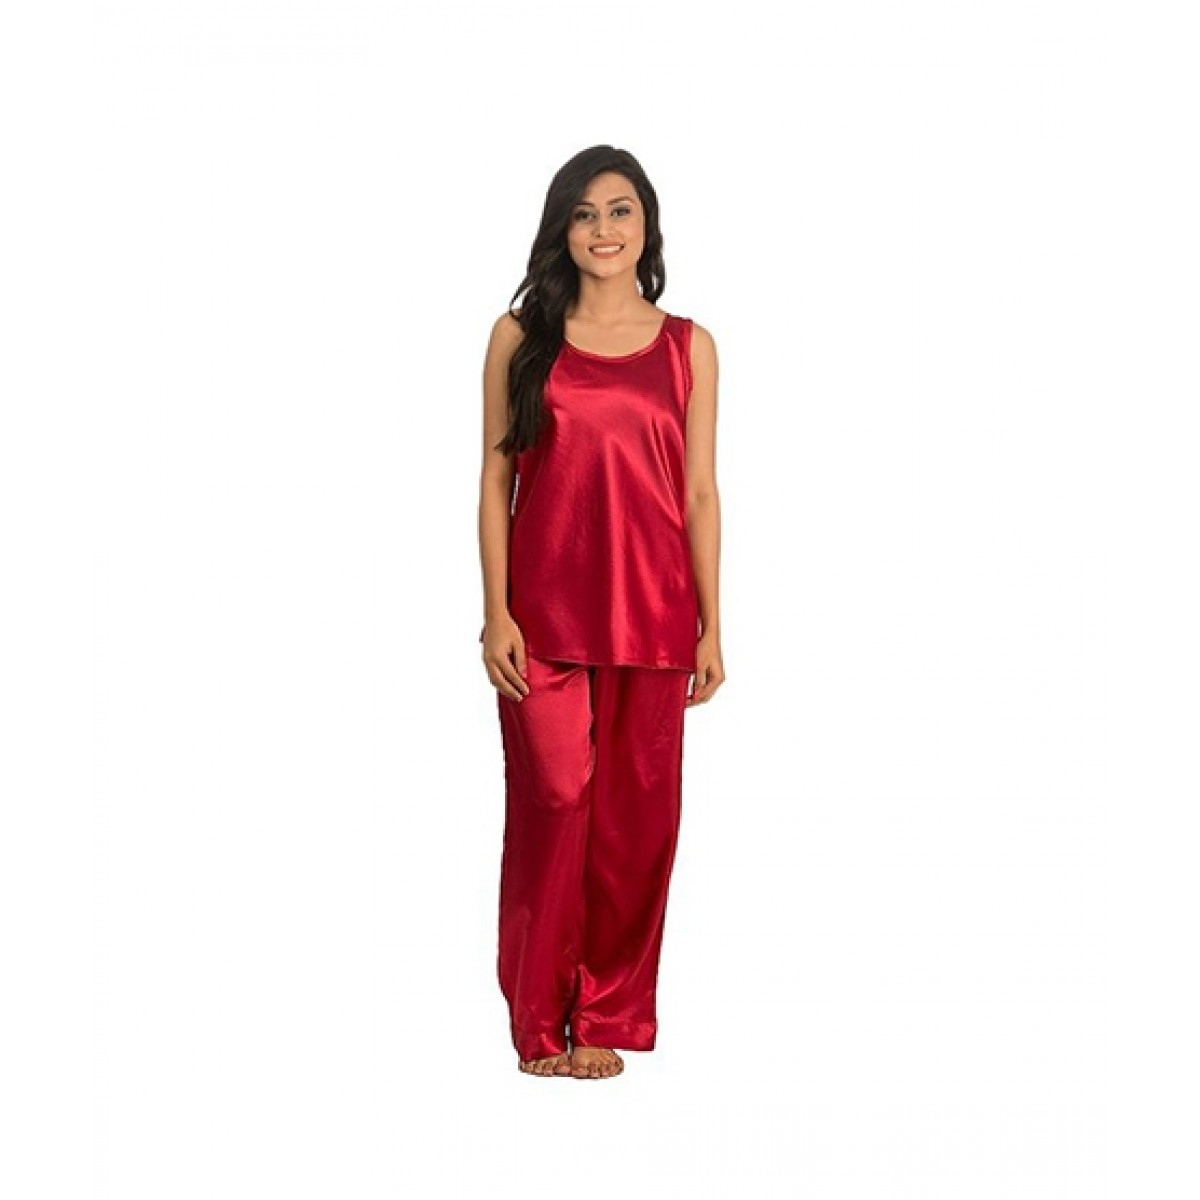 ae542d2948b Stylesonline Sleeveless Silk Nighty For Women - Red